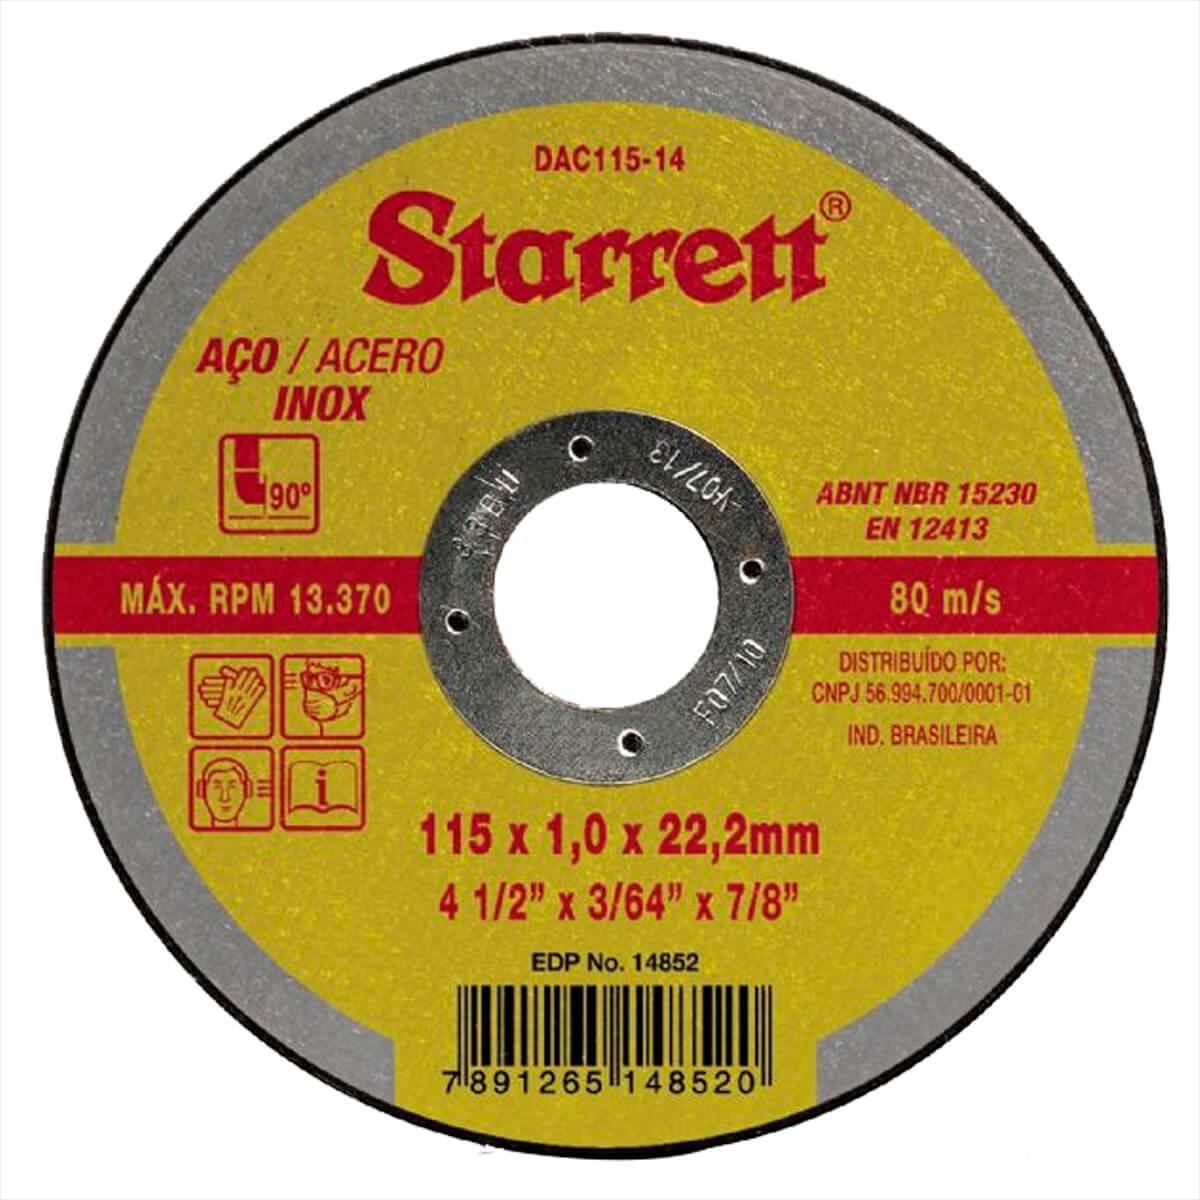 Disco de Corte Aco Inox 115x10x222 mm 4 12 - Starrett